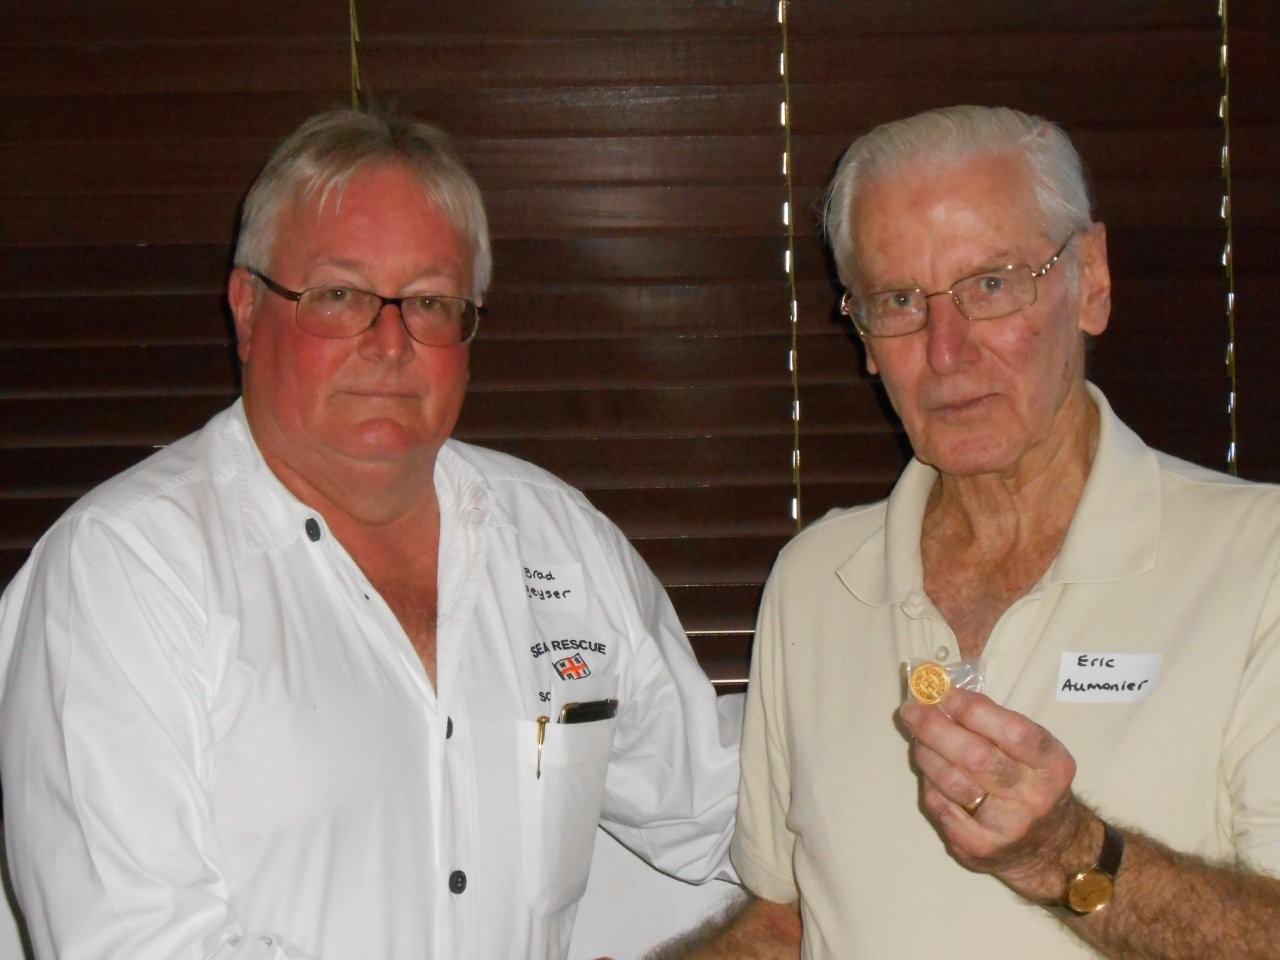 Brad Geyser hands over a gold bequestor's badge to proud supporter Eric Aumonier.